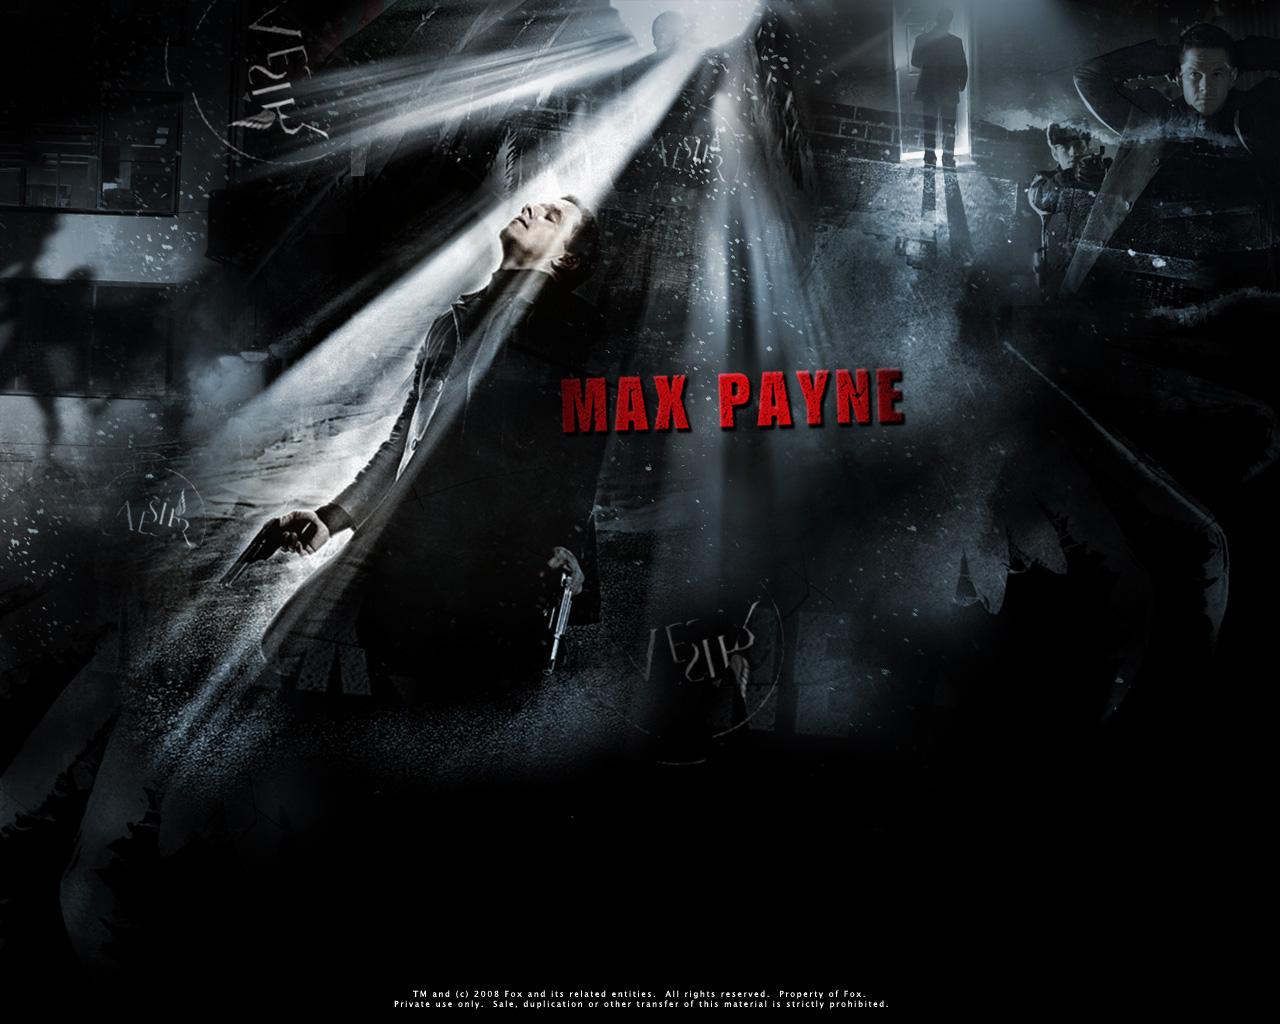 max payne 1 concept art